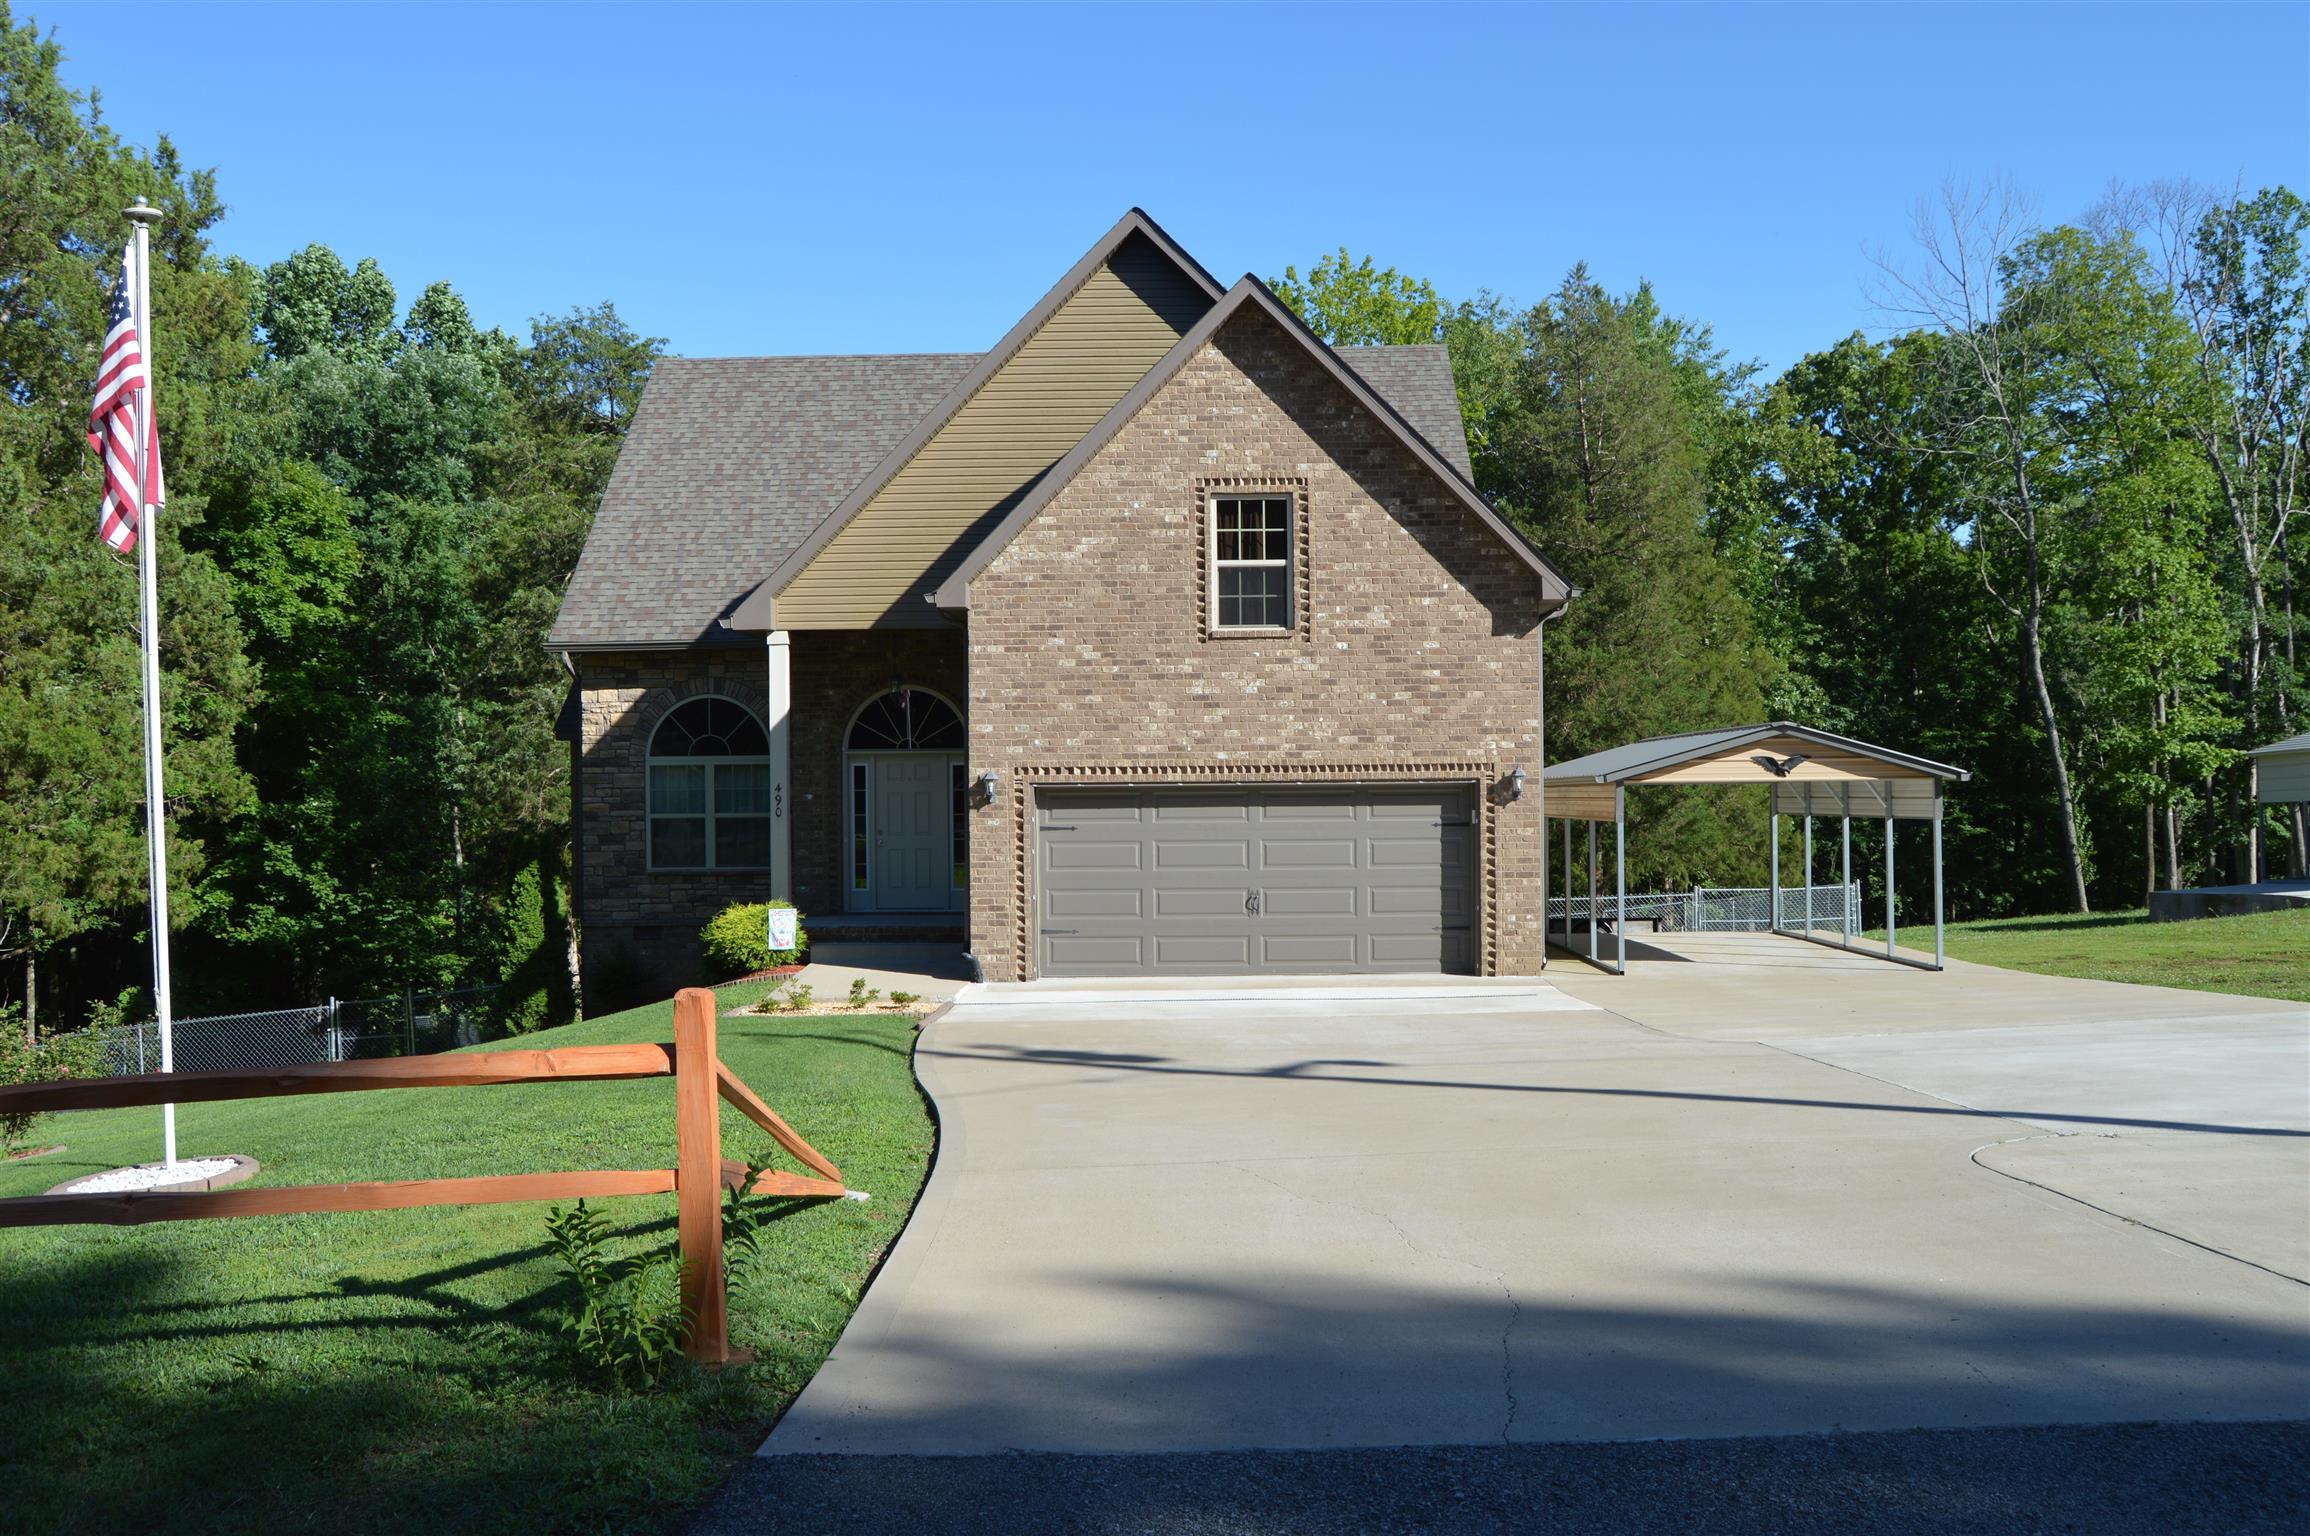 490 Salem Ridge Rd, Clarksville, TN 37040 - Clarksville, TN real estate listing